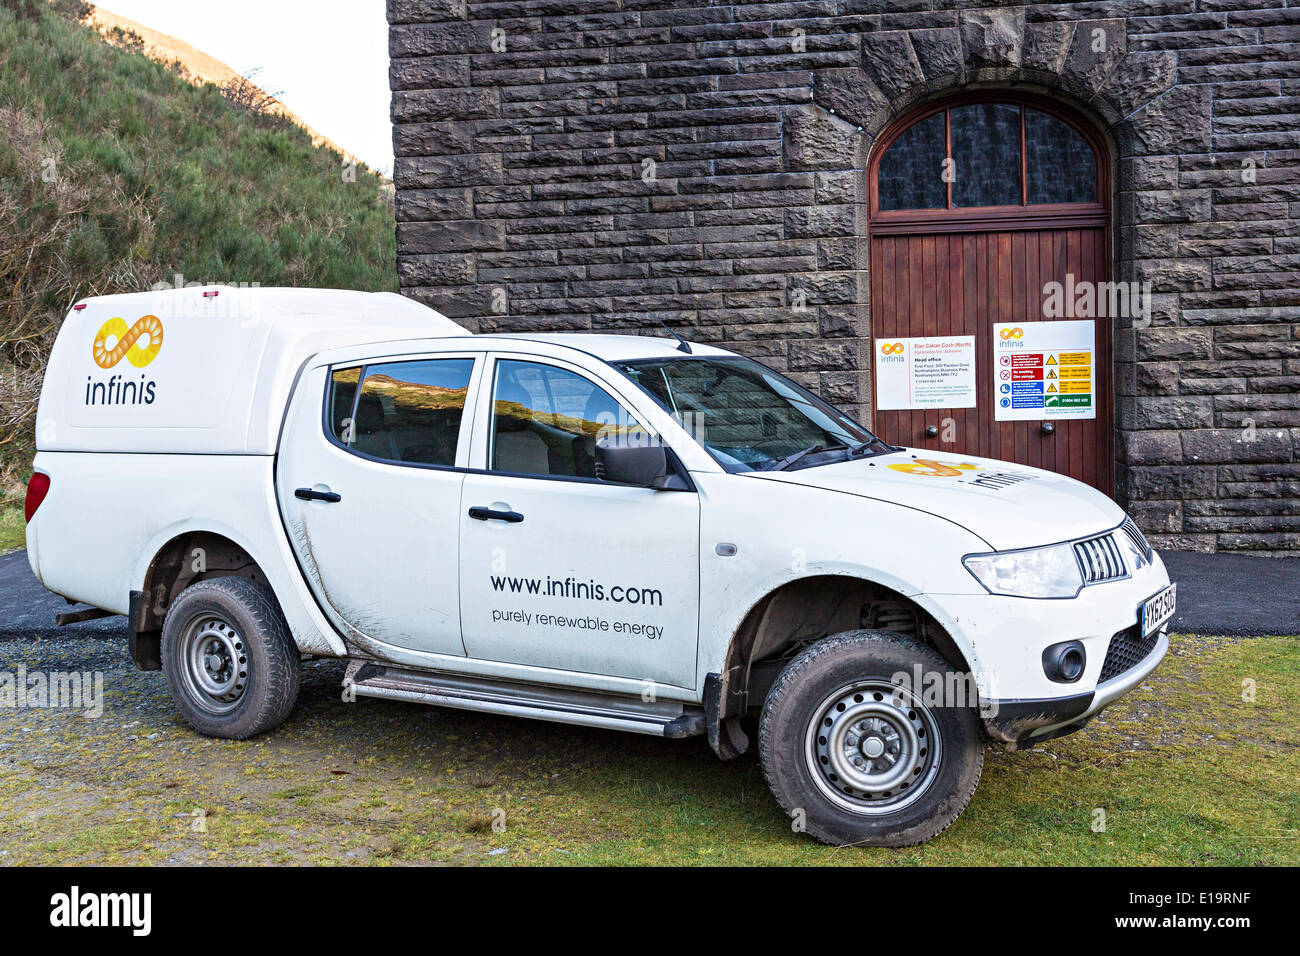 Infinitis erneuerbare Energien van an Elan Valley Reservoir, Powys, Wales, UK Stockbild